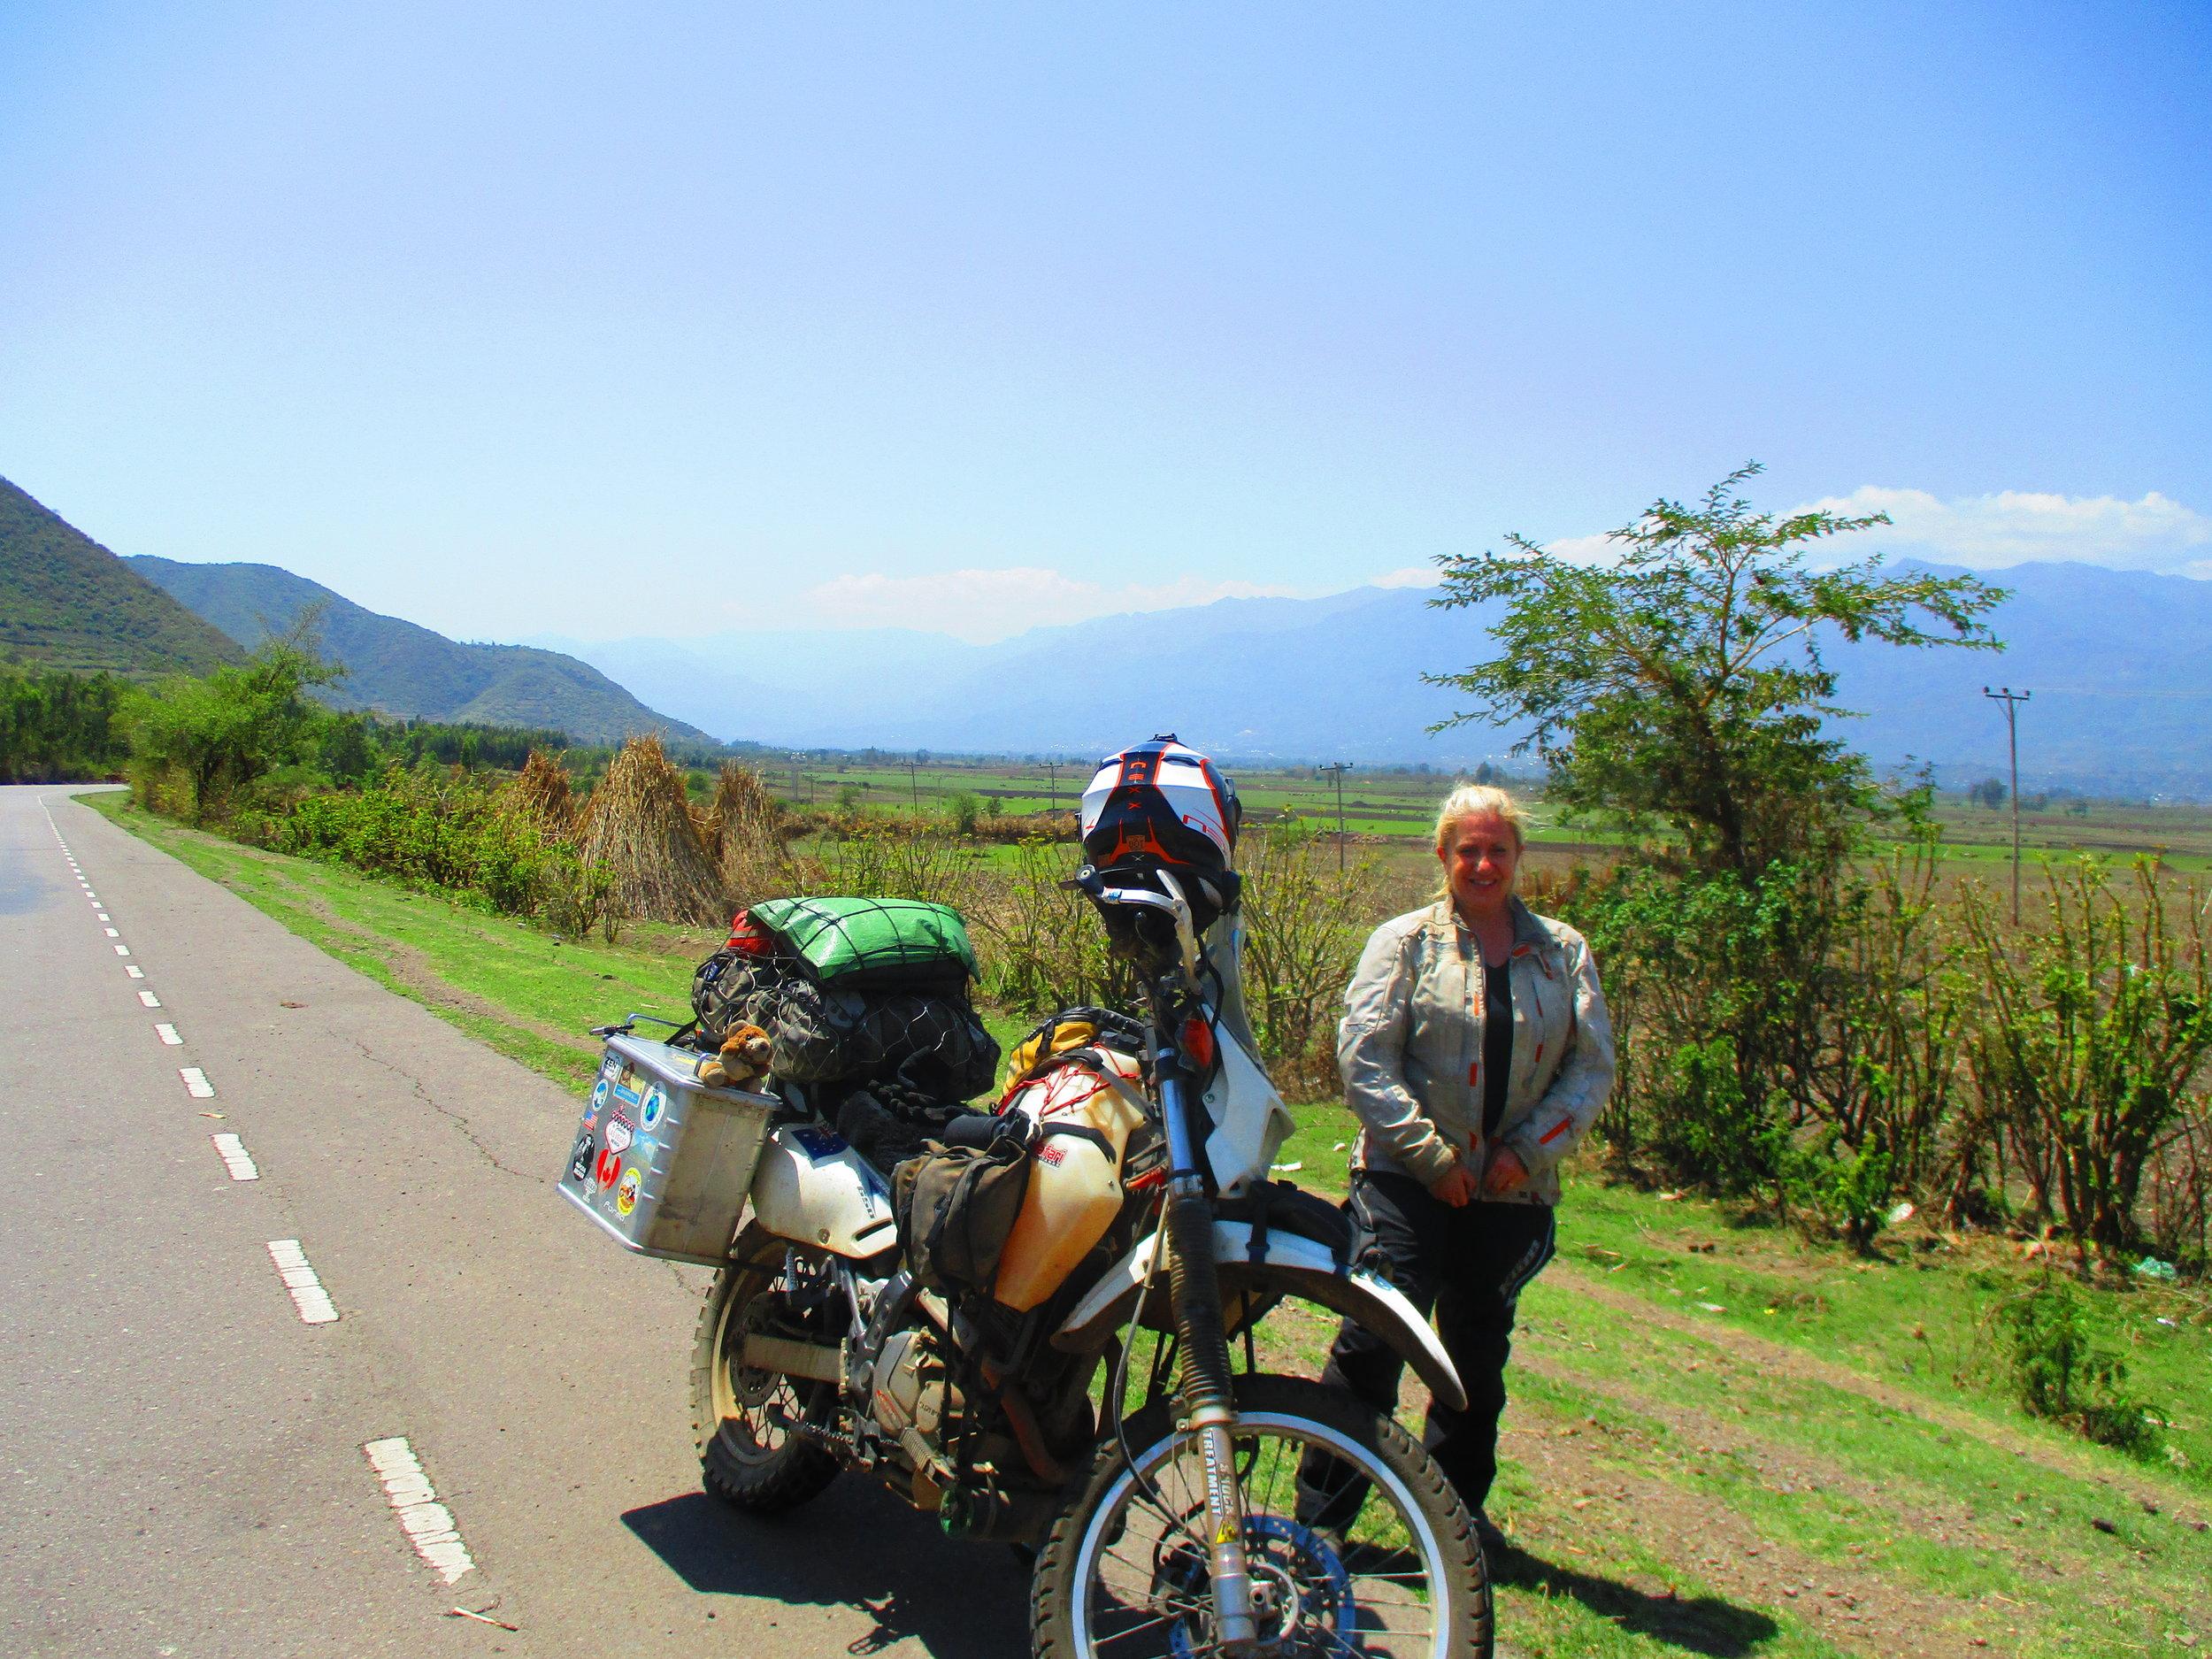 The road north of Addis